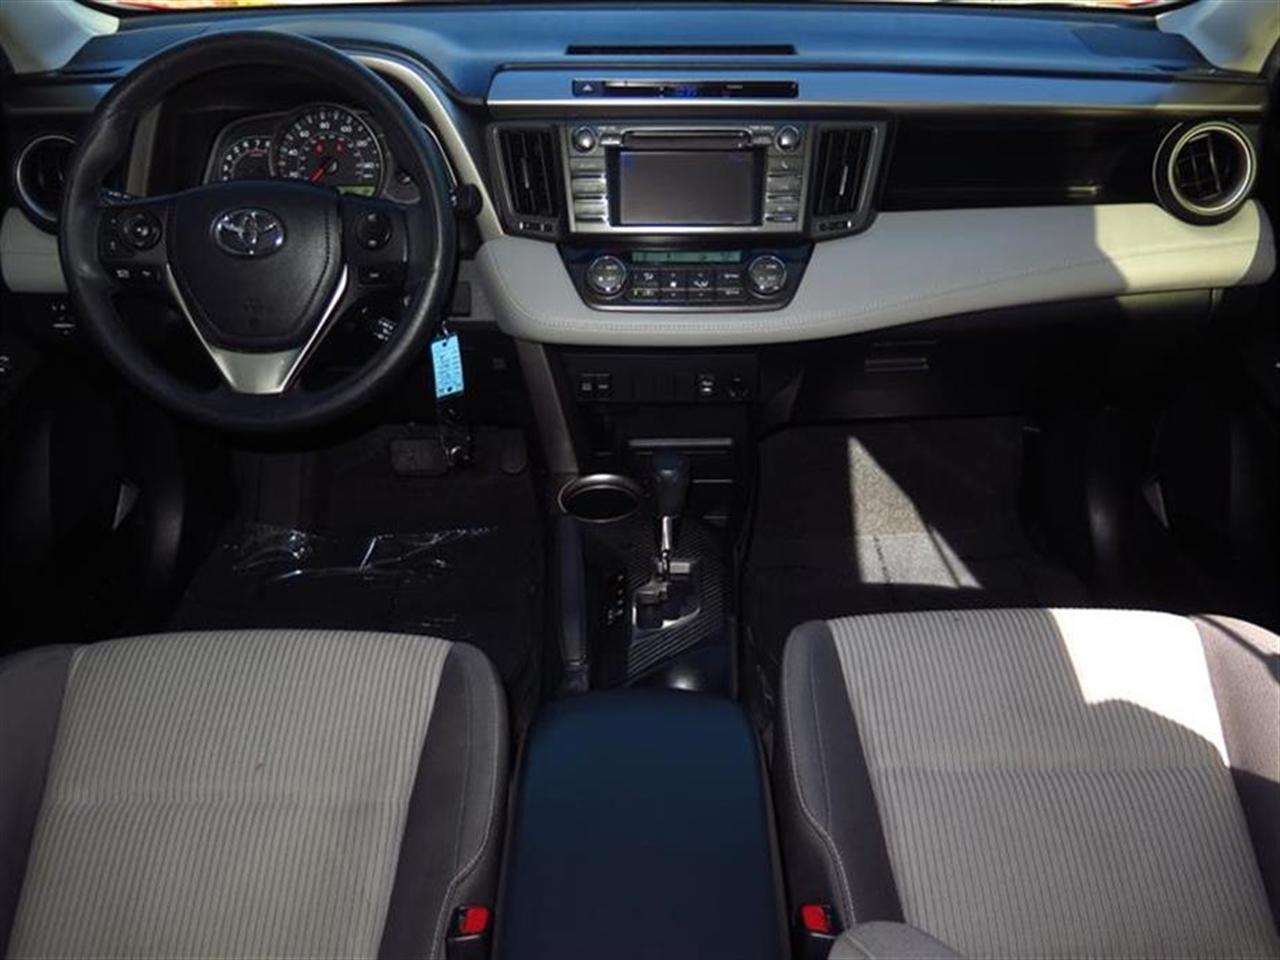 2013 TOYOTA RAV4 FWD 4dr XLE 54365 miles 2 12V aux pwr outlets 8 cupbottle holders 6040